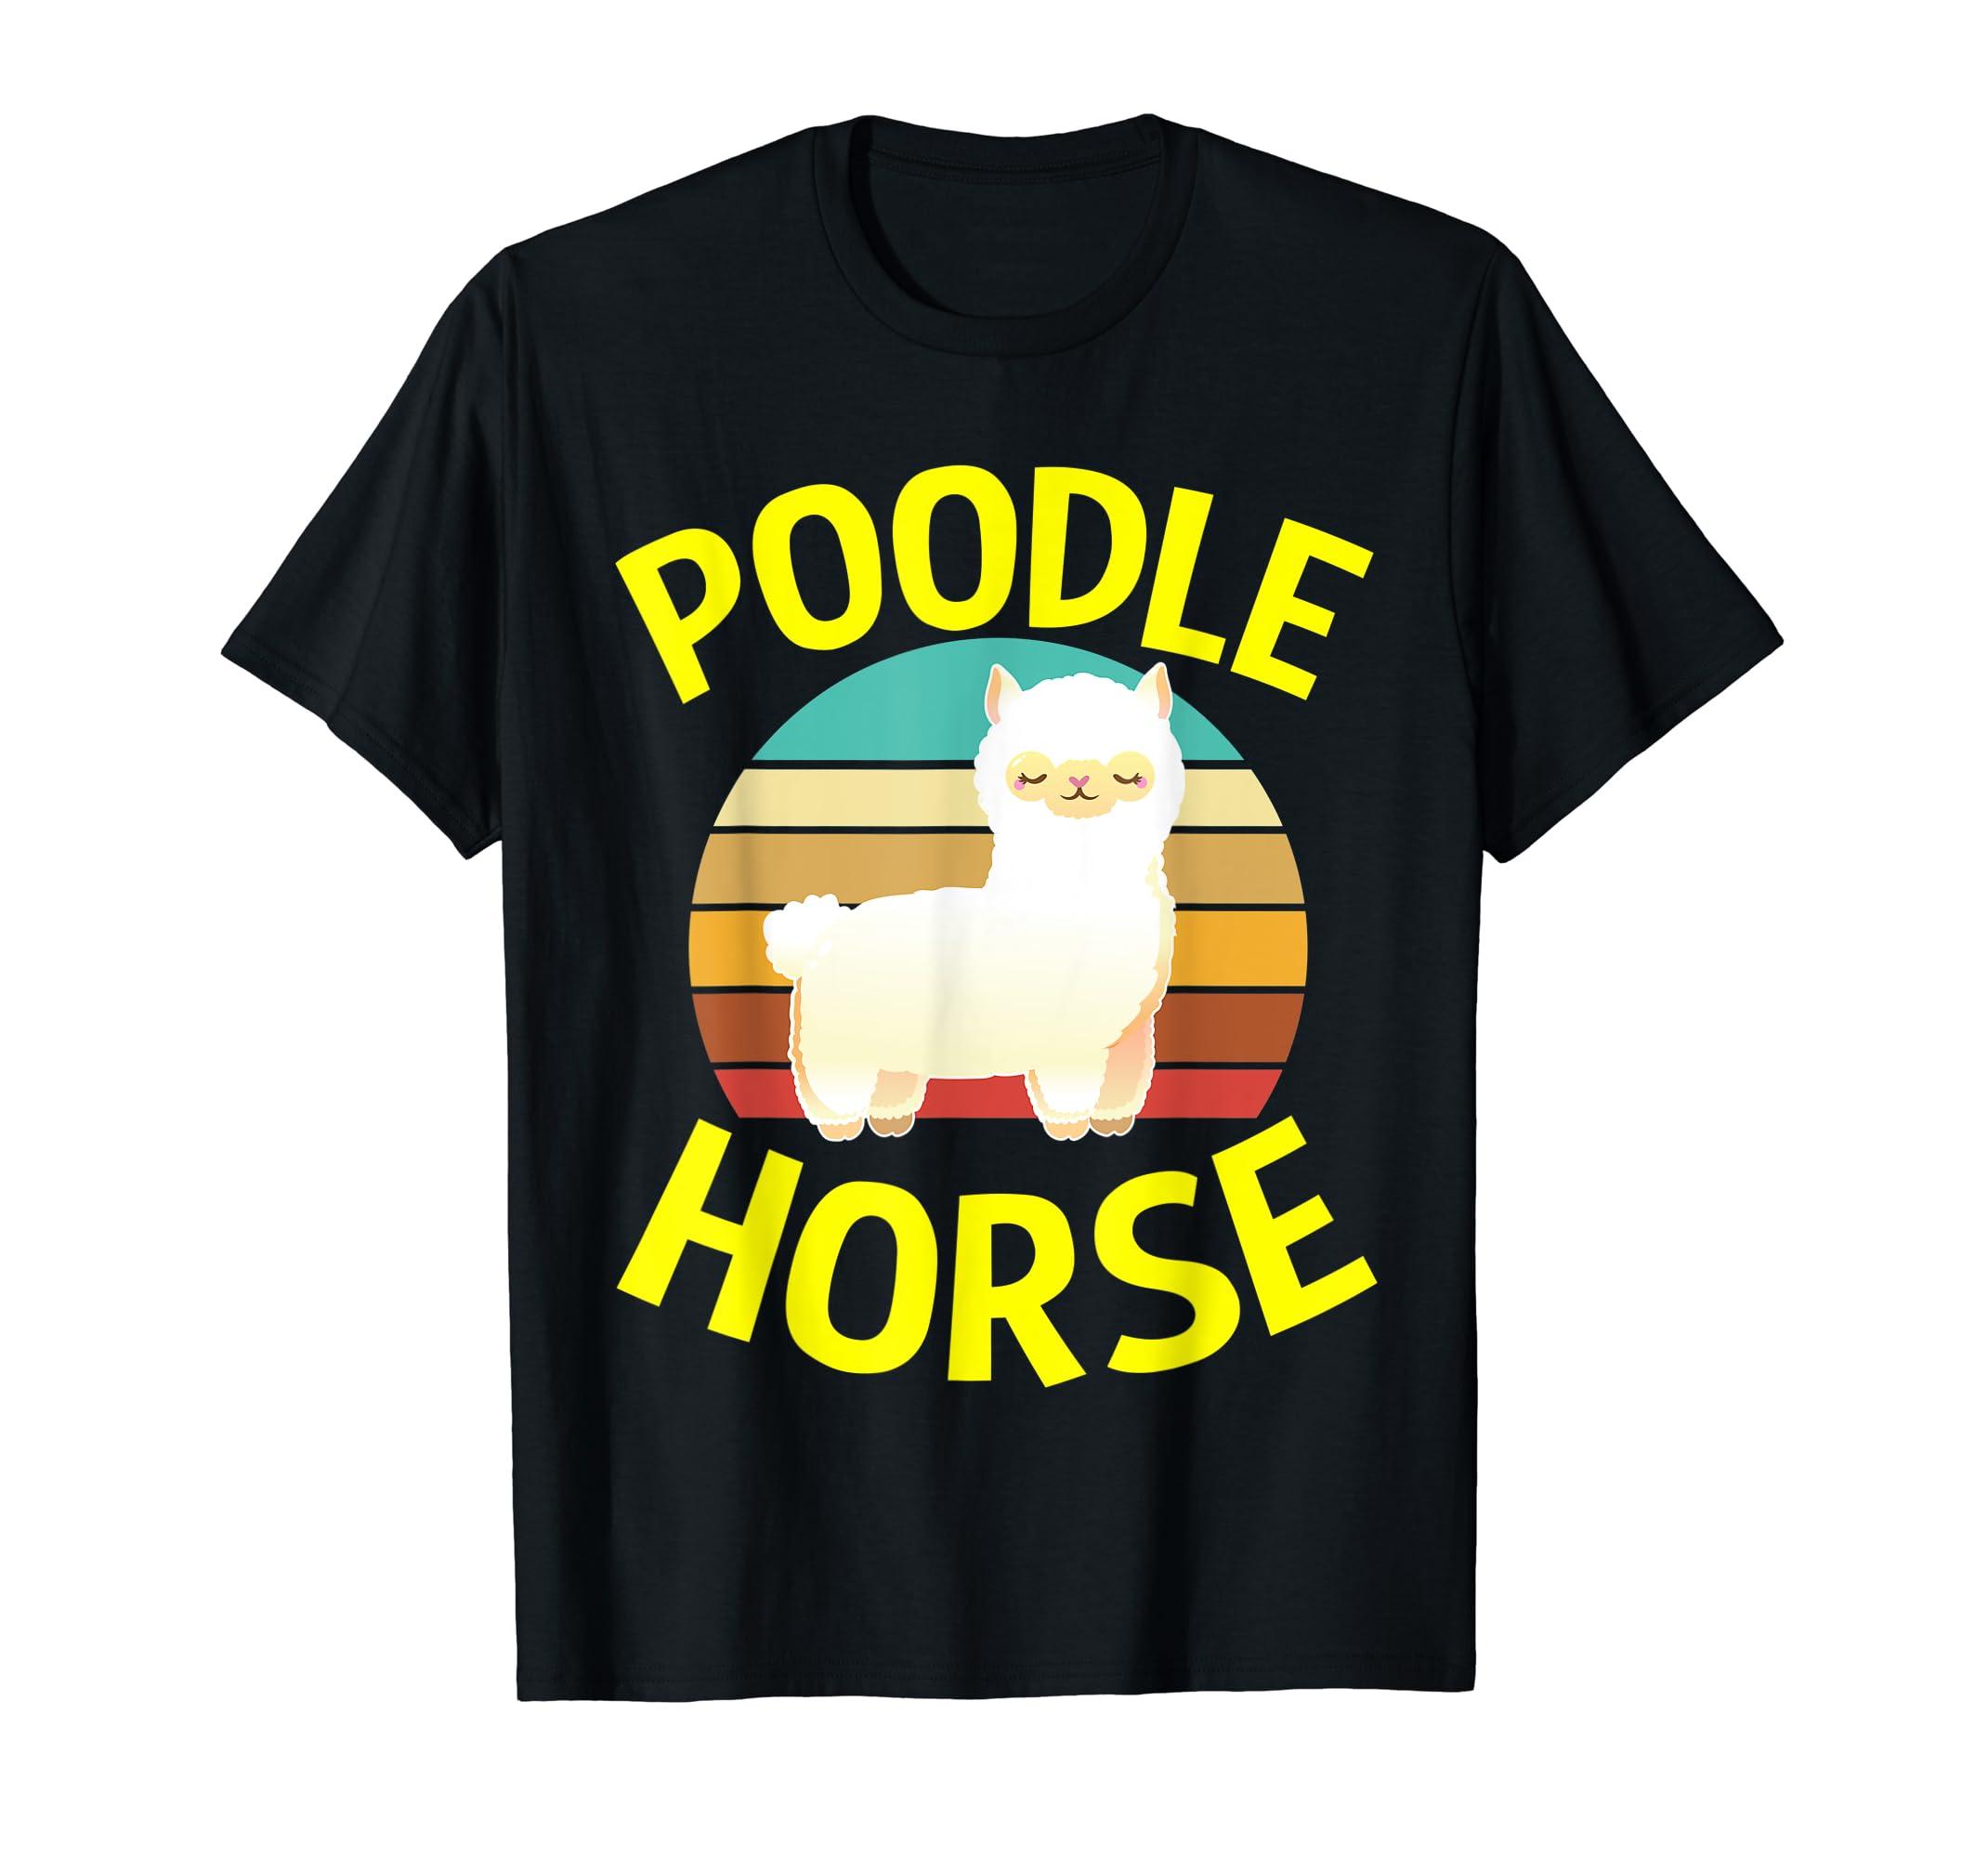 Poodle Horse T Shirt Llama Gifts for Men Women Kids Baby-Men's T-Shirt-Black